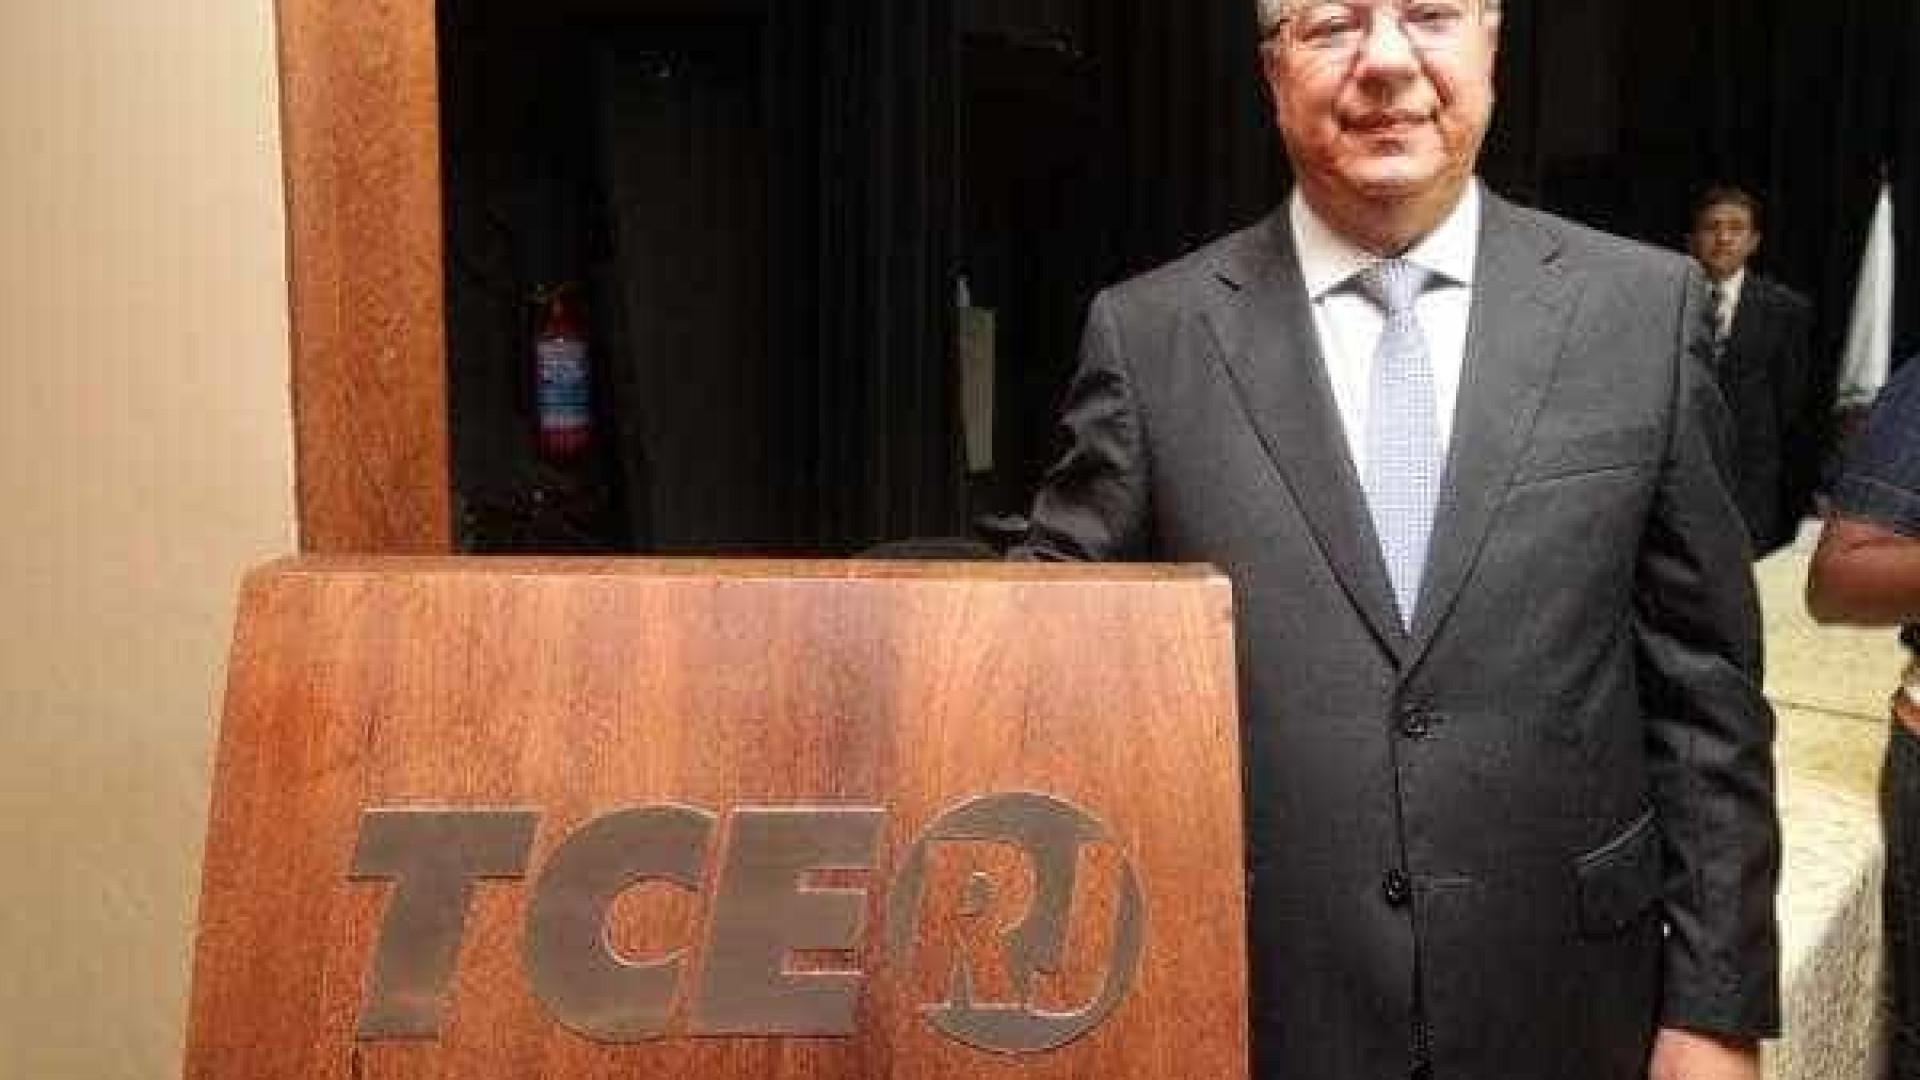 Delação: presidente do TCE-RJ pediu R$ 4 milhões para aprovar edital